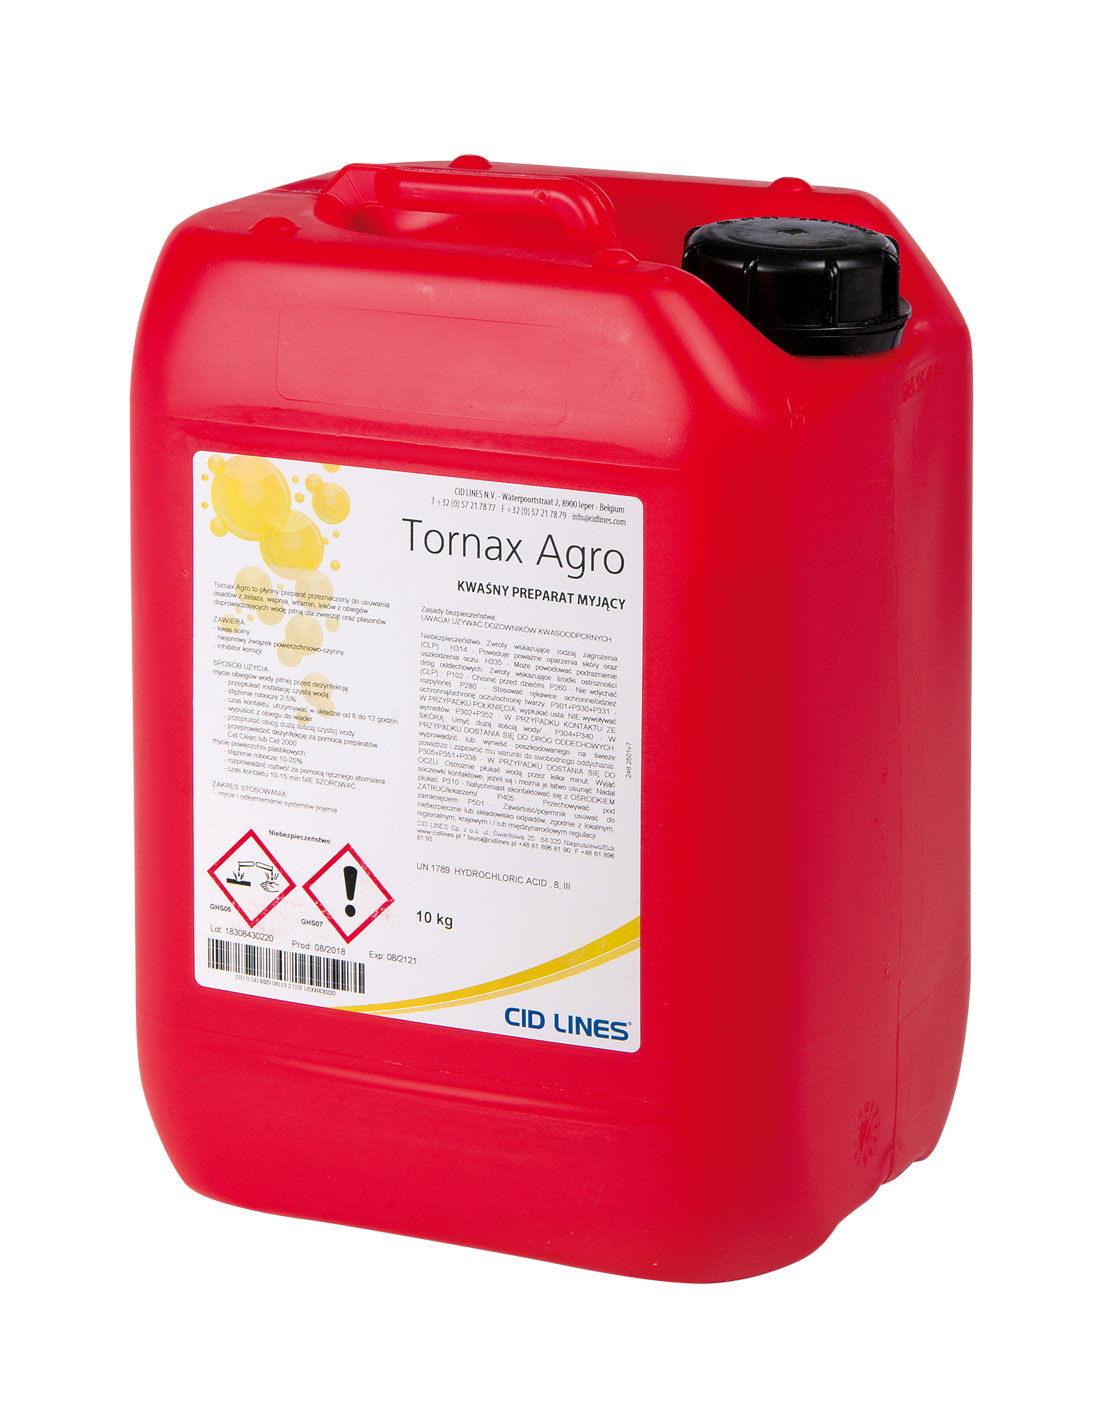 TORNAX AGRO 10 KG